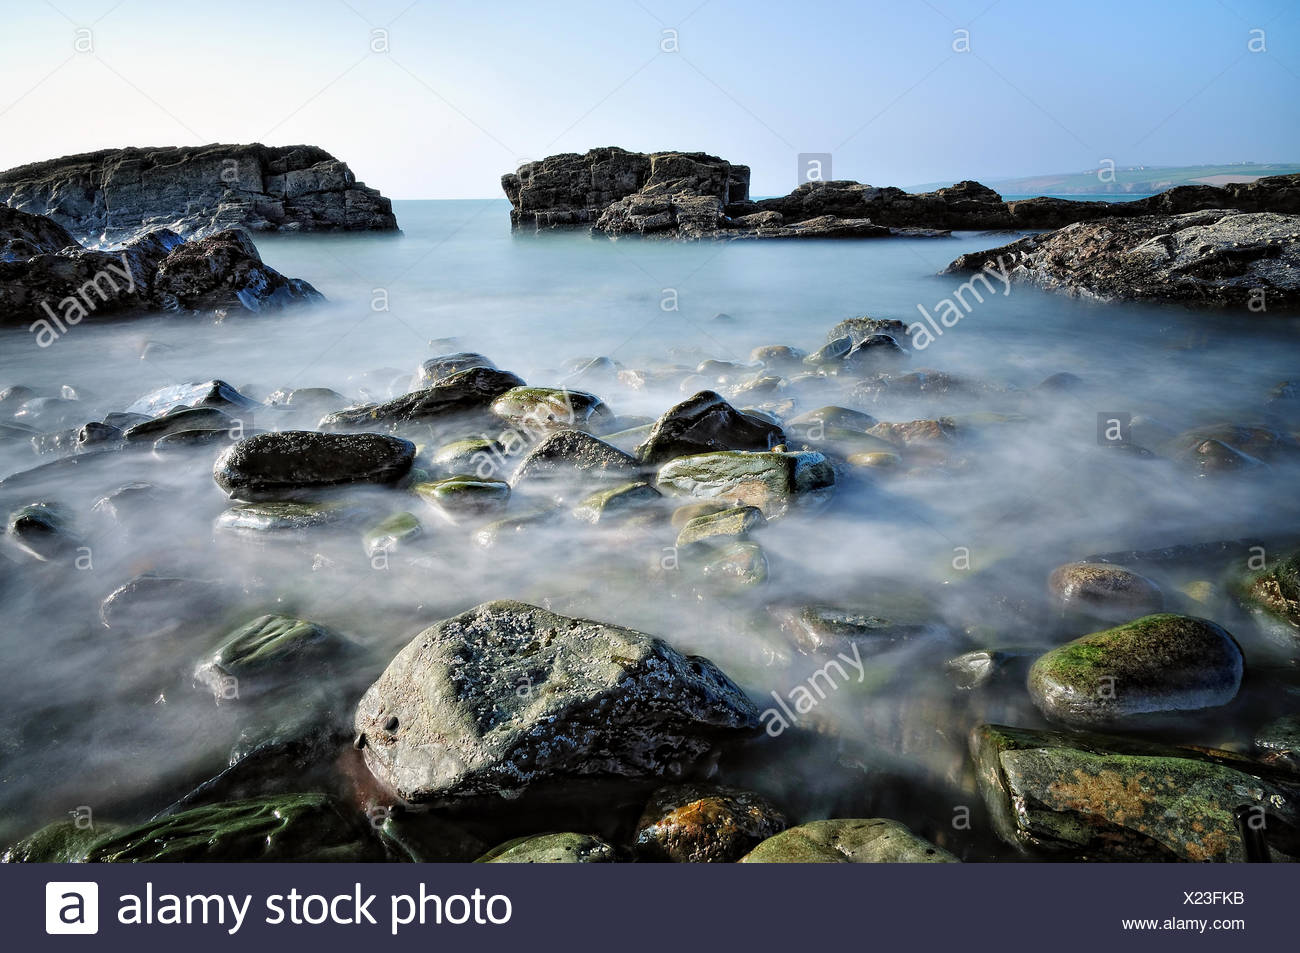 Ireland, Munster, County Cork, Kinsale, Beautiful day at seaside - Stock Image